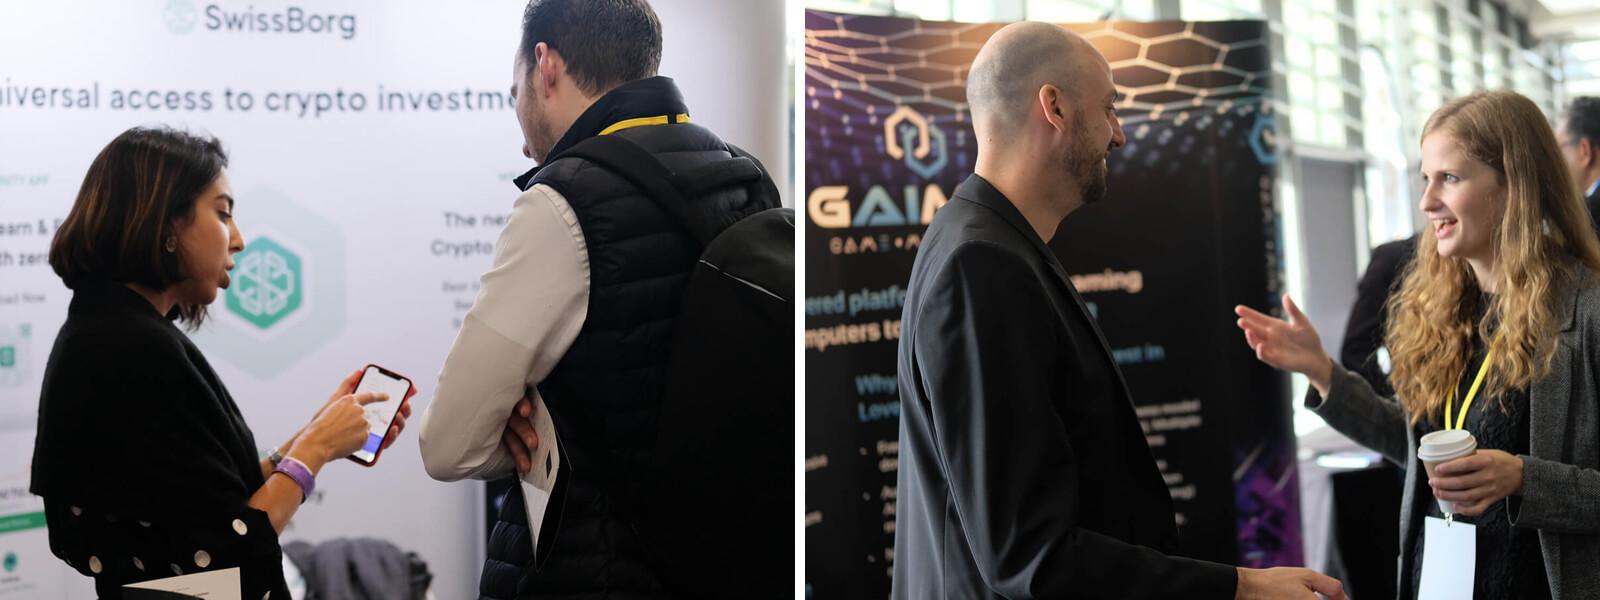 SwissBorg team at CC Forum 2019 London